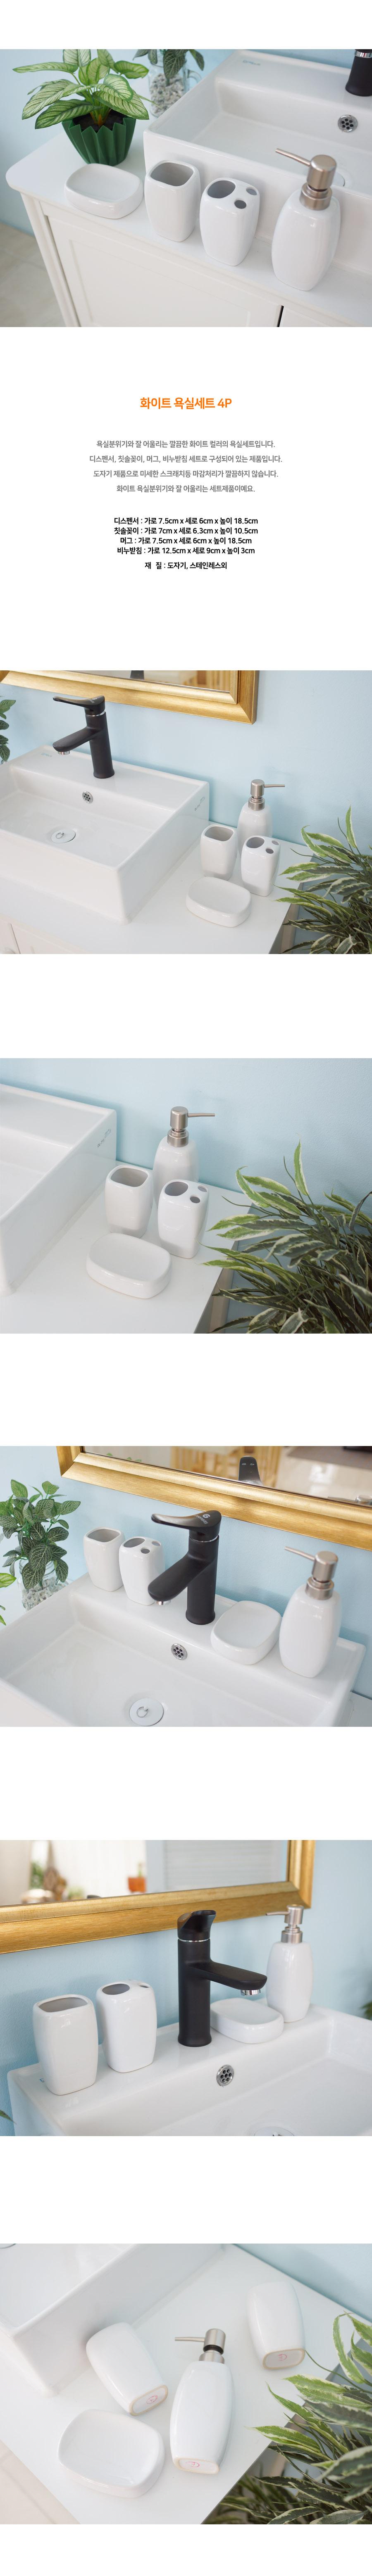 white bath 4p set.jpg